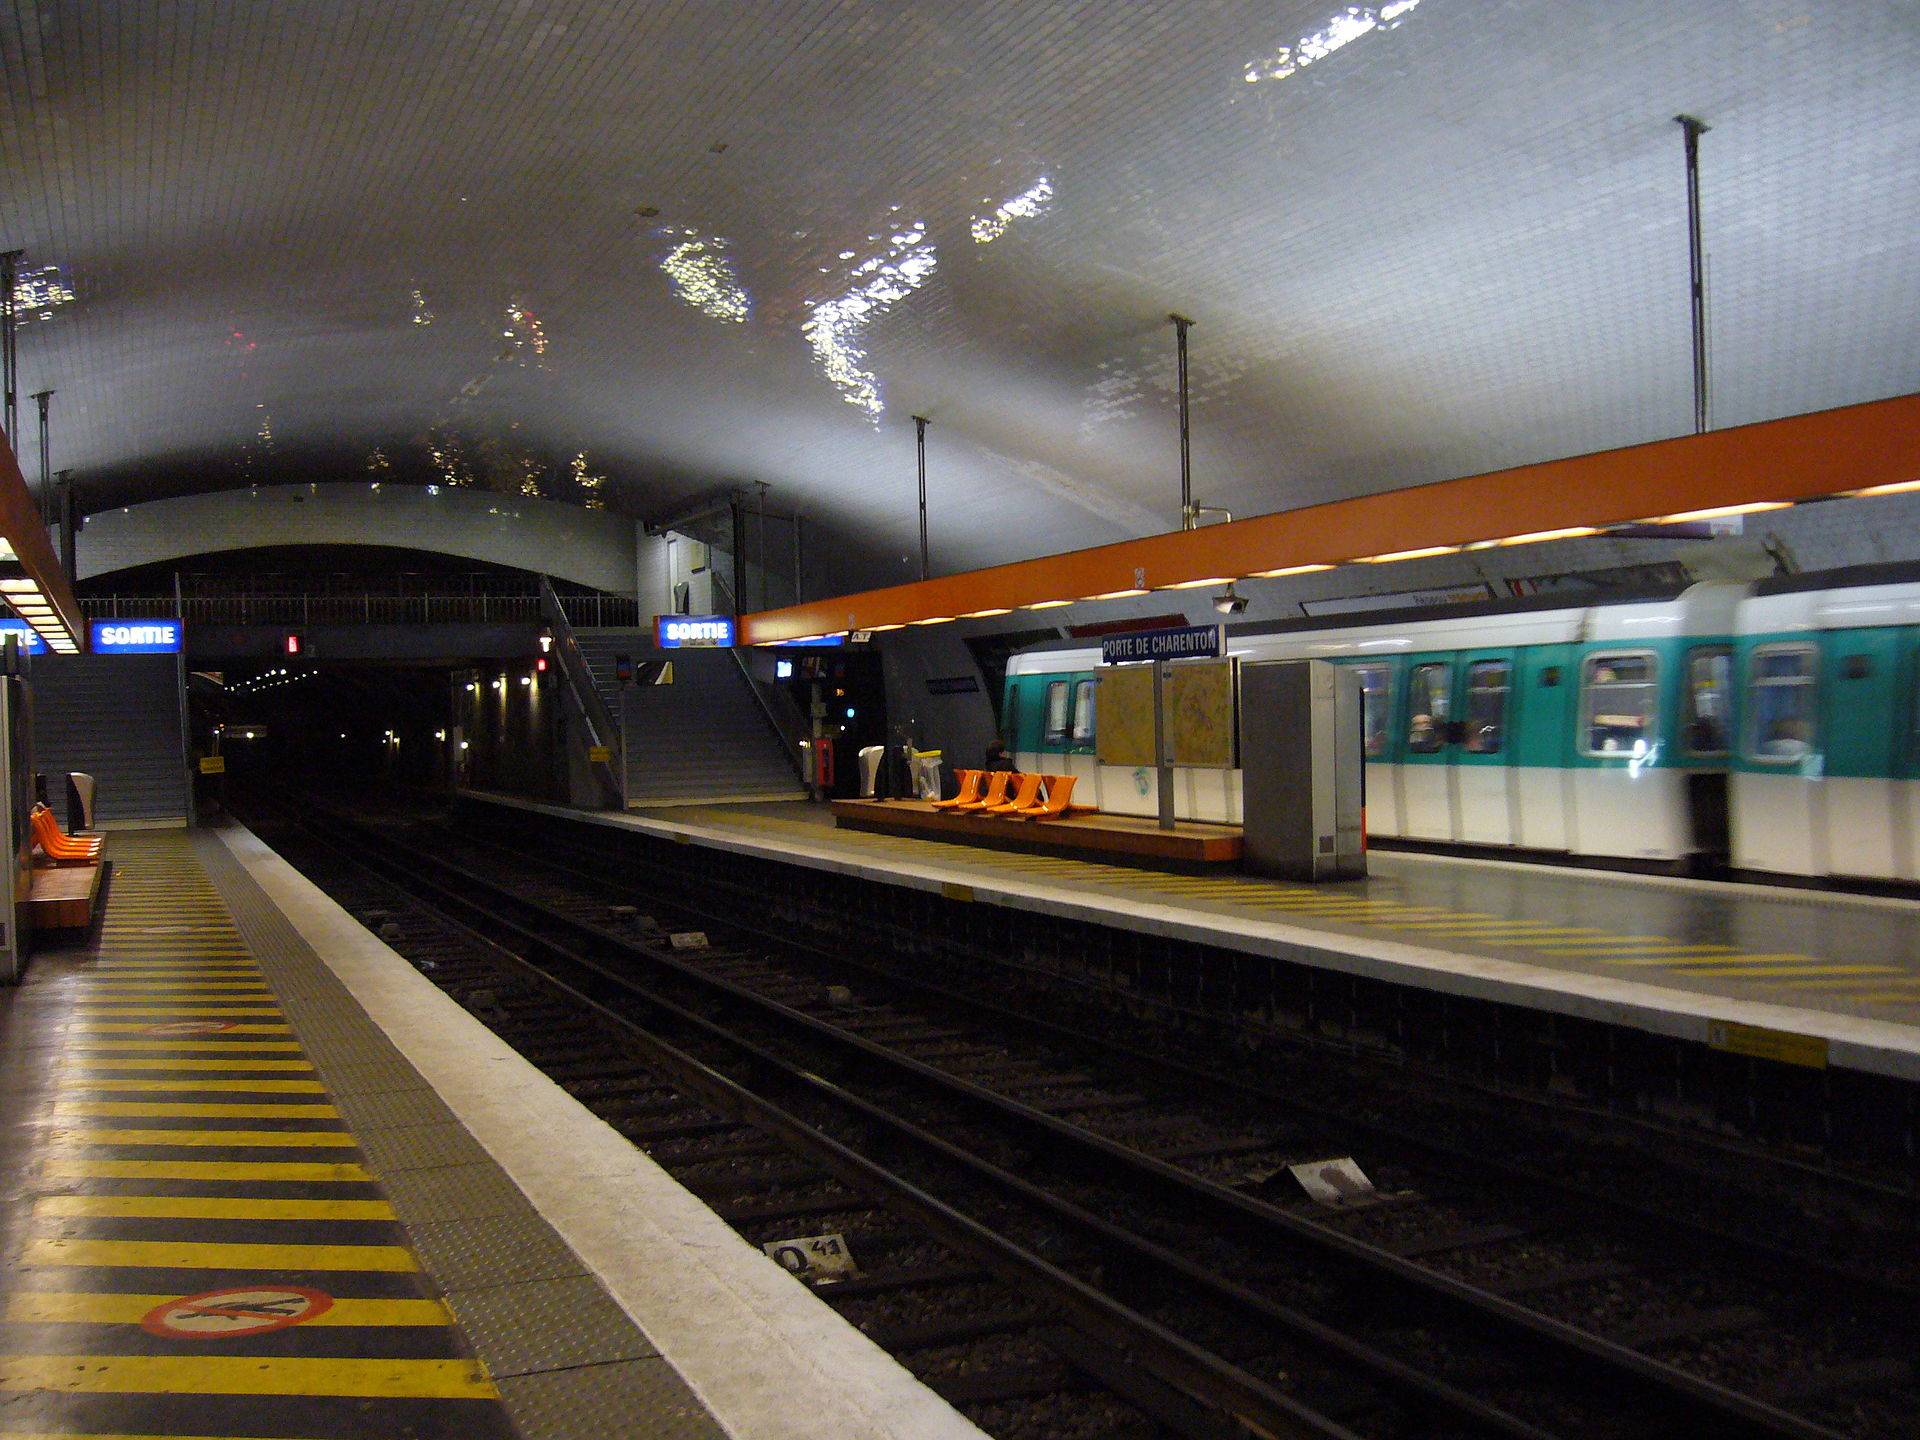 Porte de charenton stanice metra v pa i wikipedie - Porte de charenton metro ...